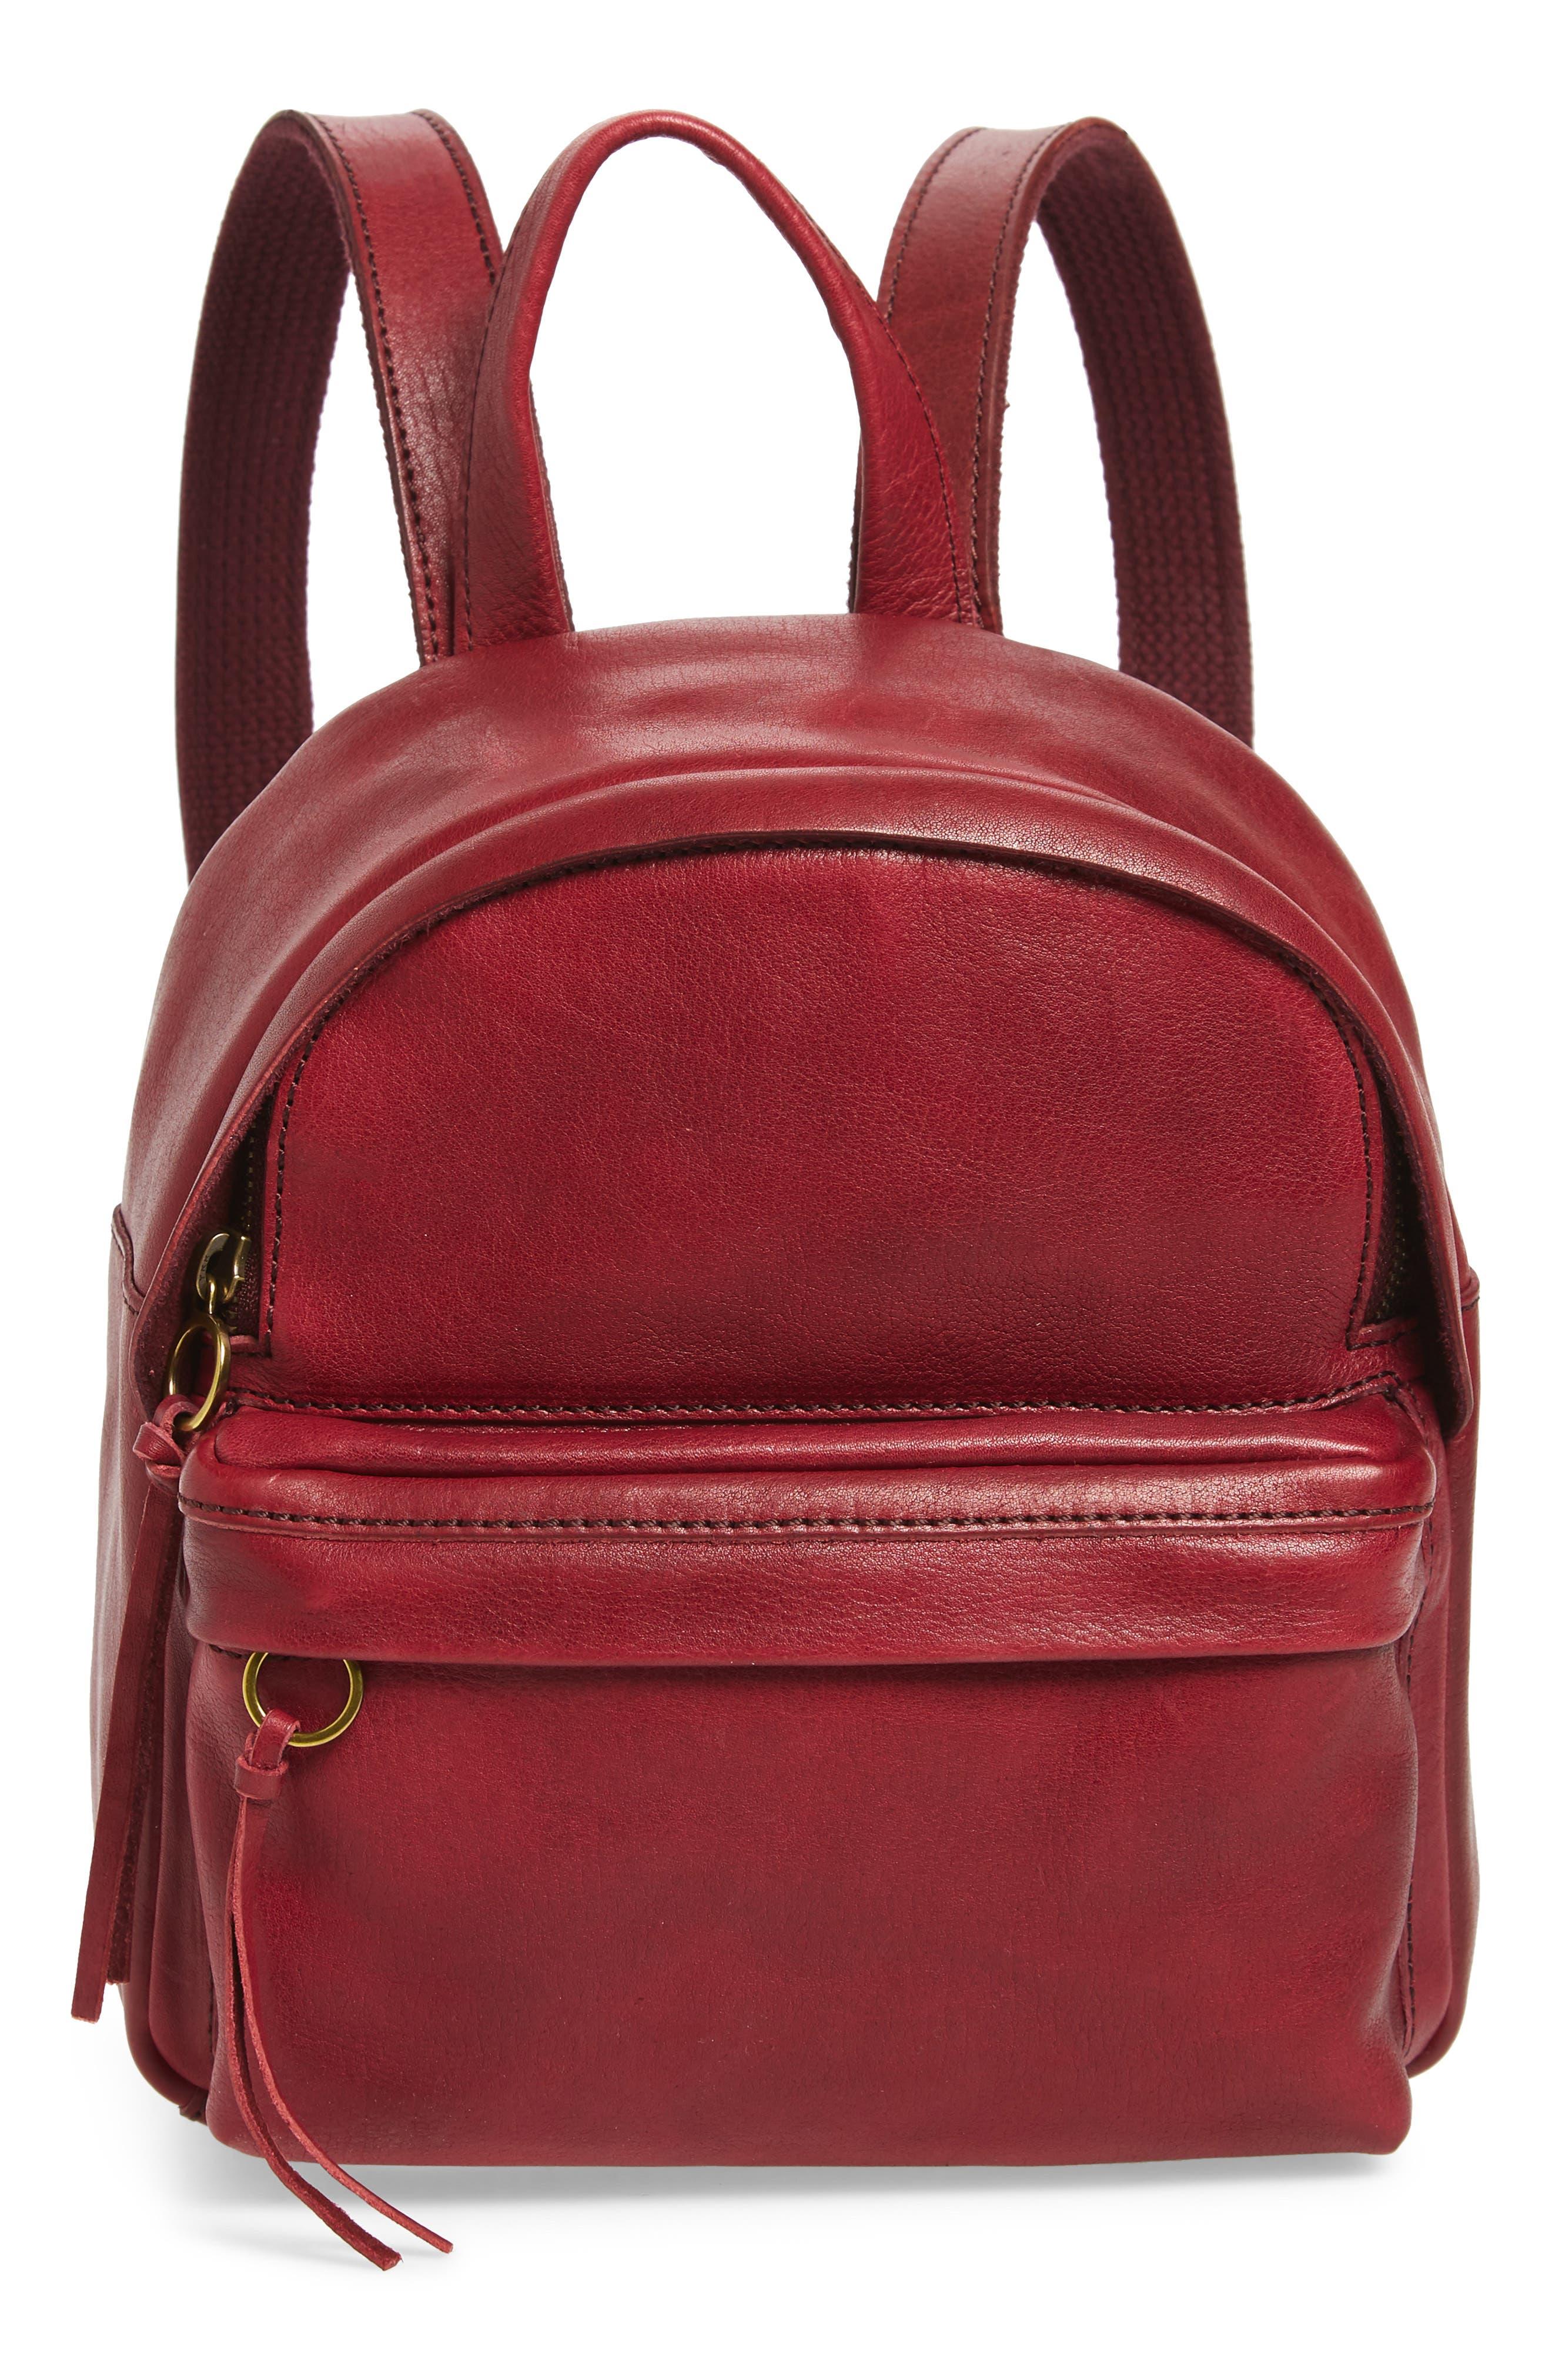 Mini Lorimer Leather Backpack,                             Main thumbnail 1, color,                             DARK CABERNET